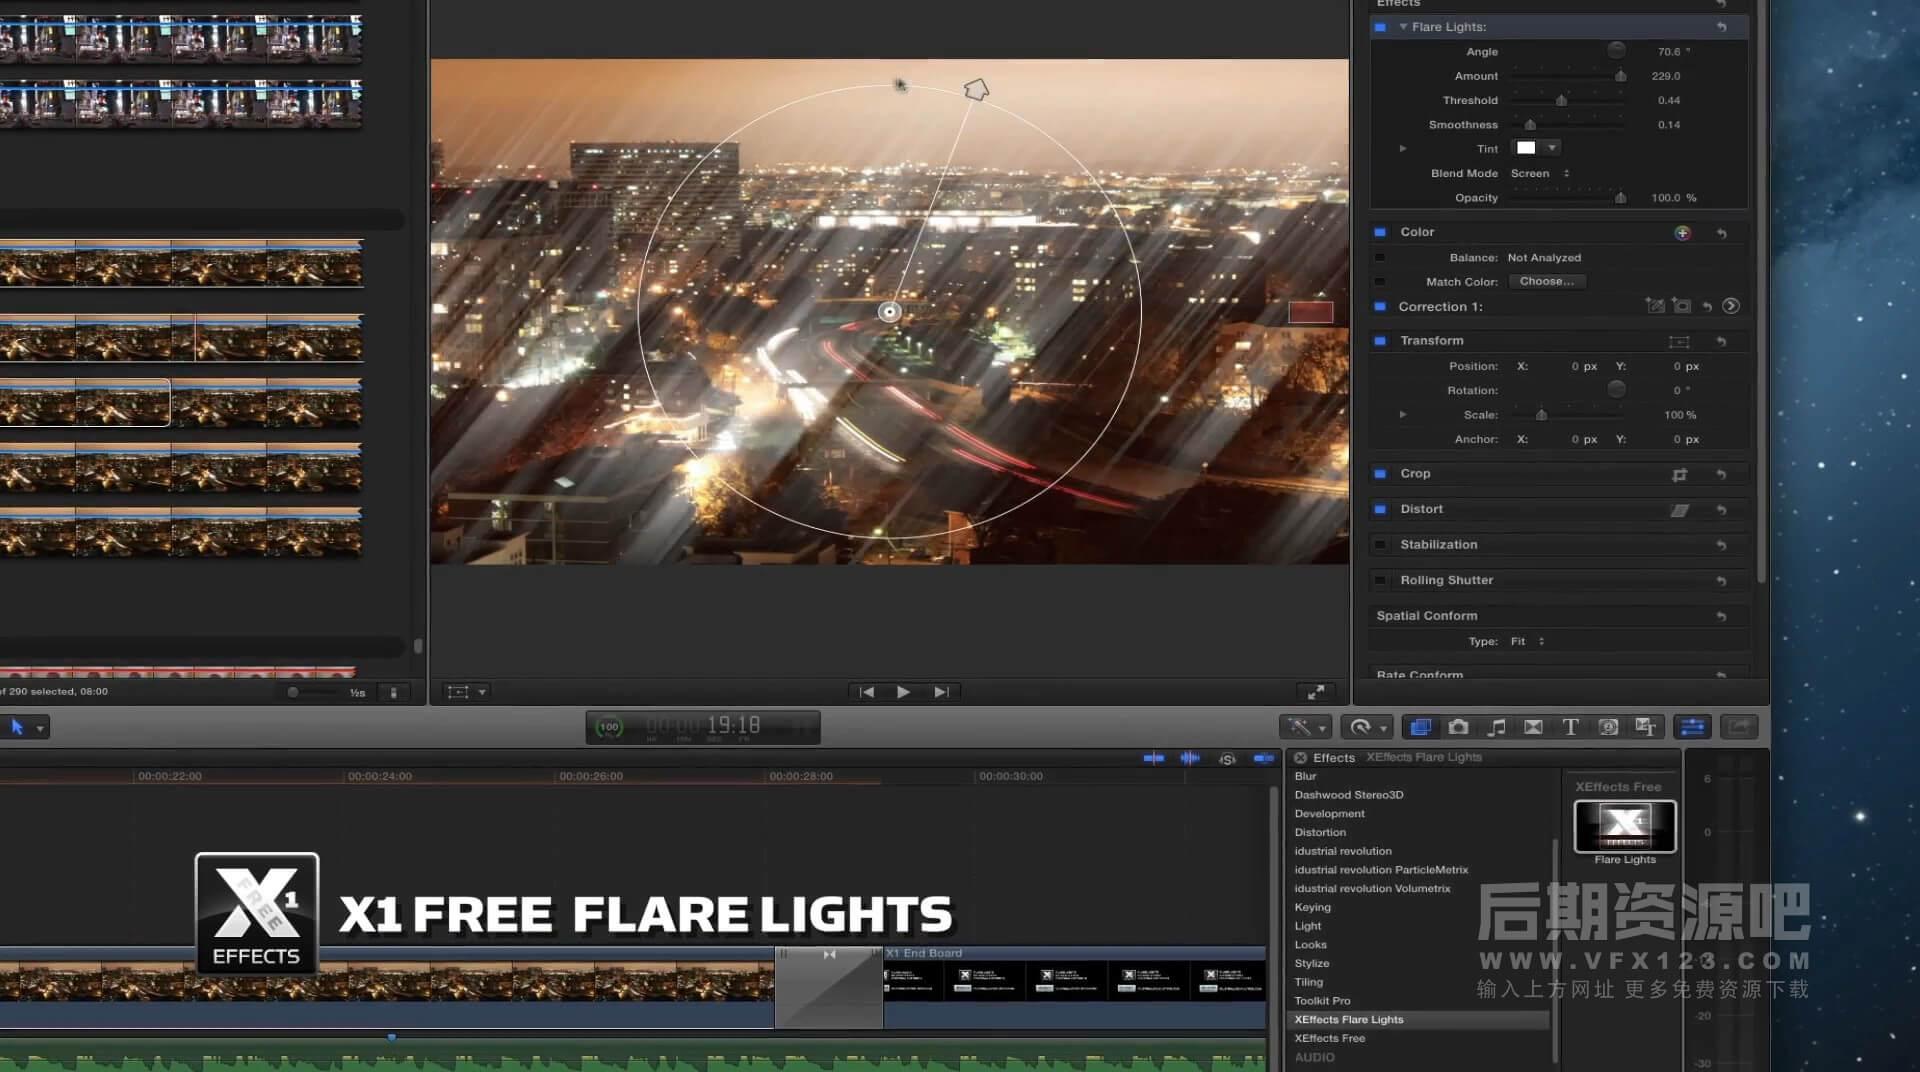 Fcpx插件 模拟相机长时间曝光条纹光效 XEffects Flare Lights